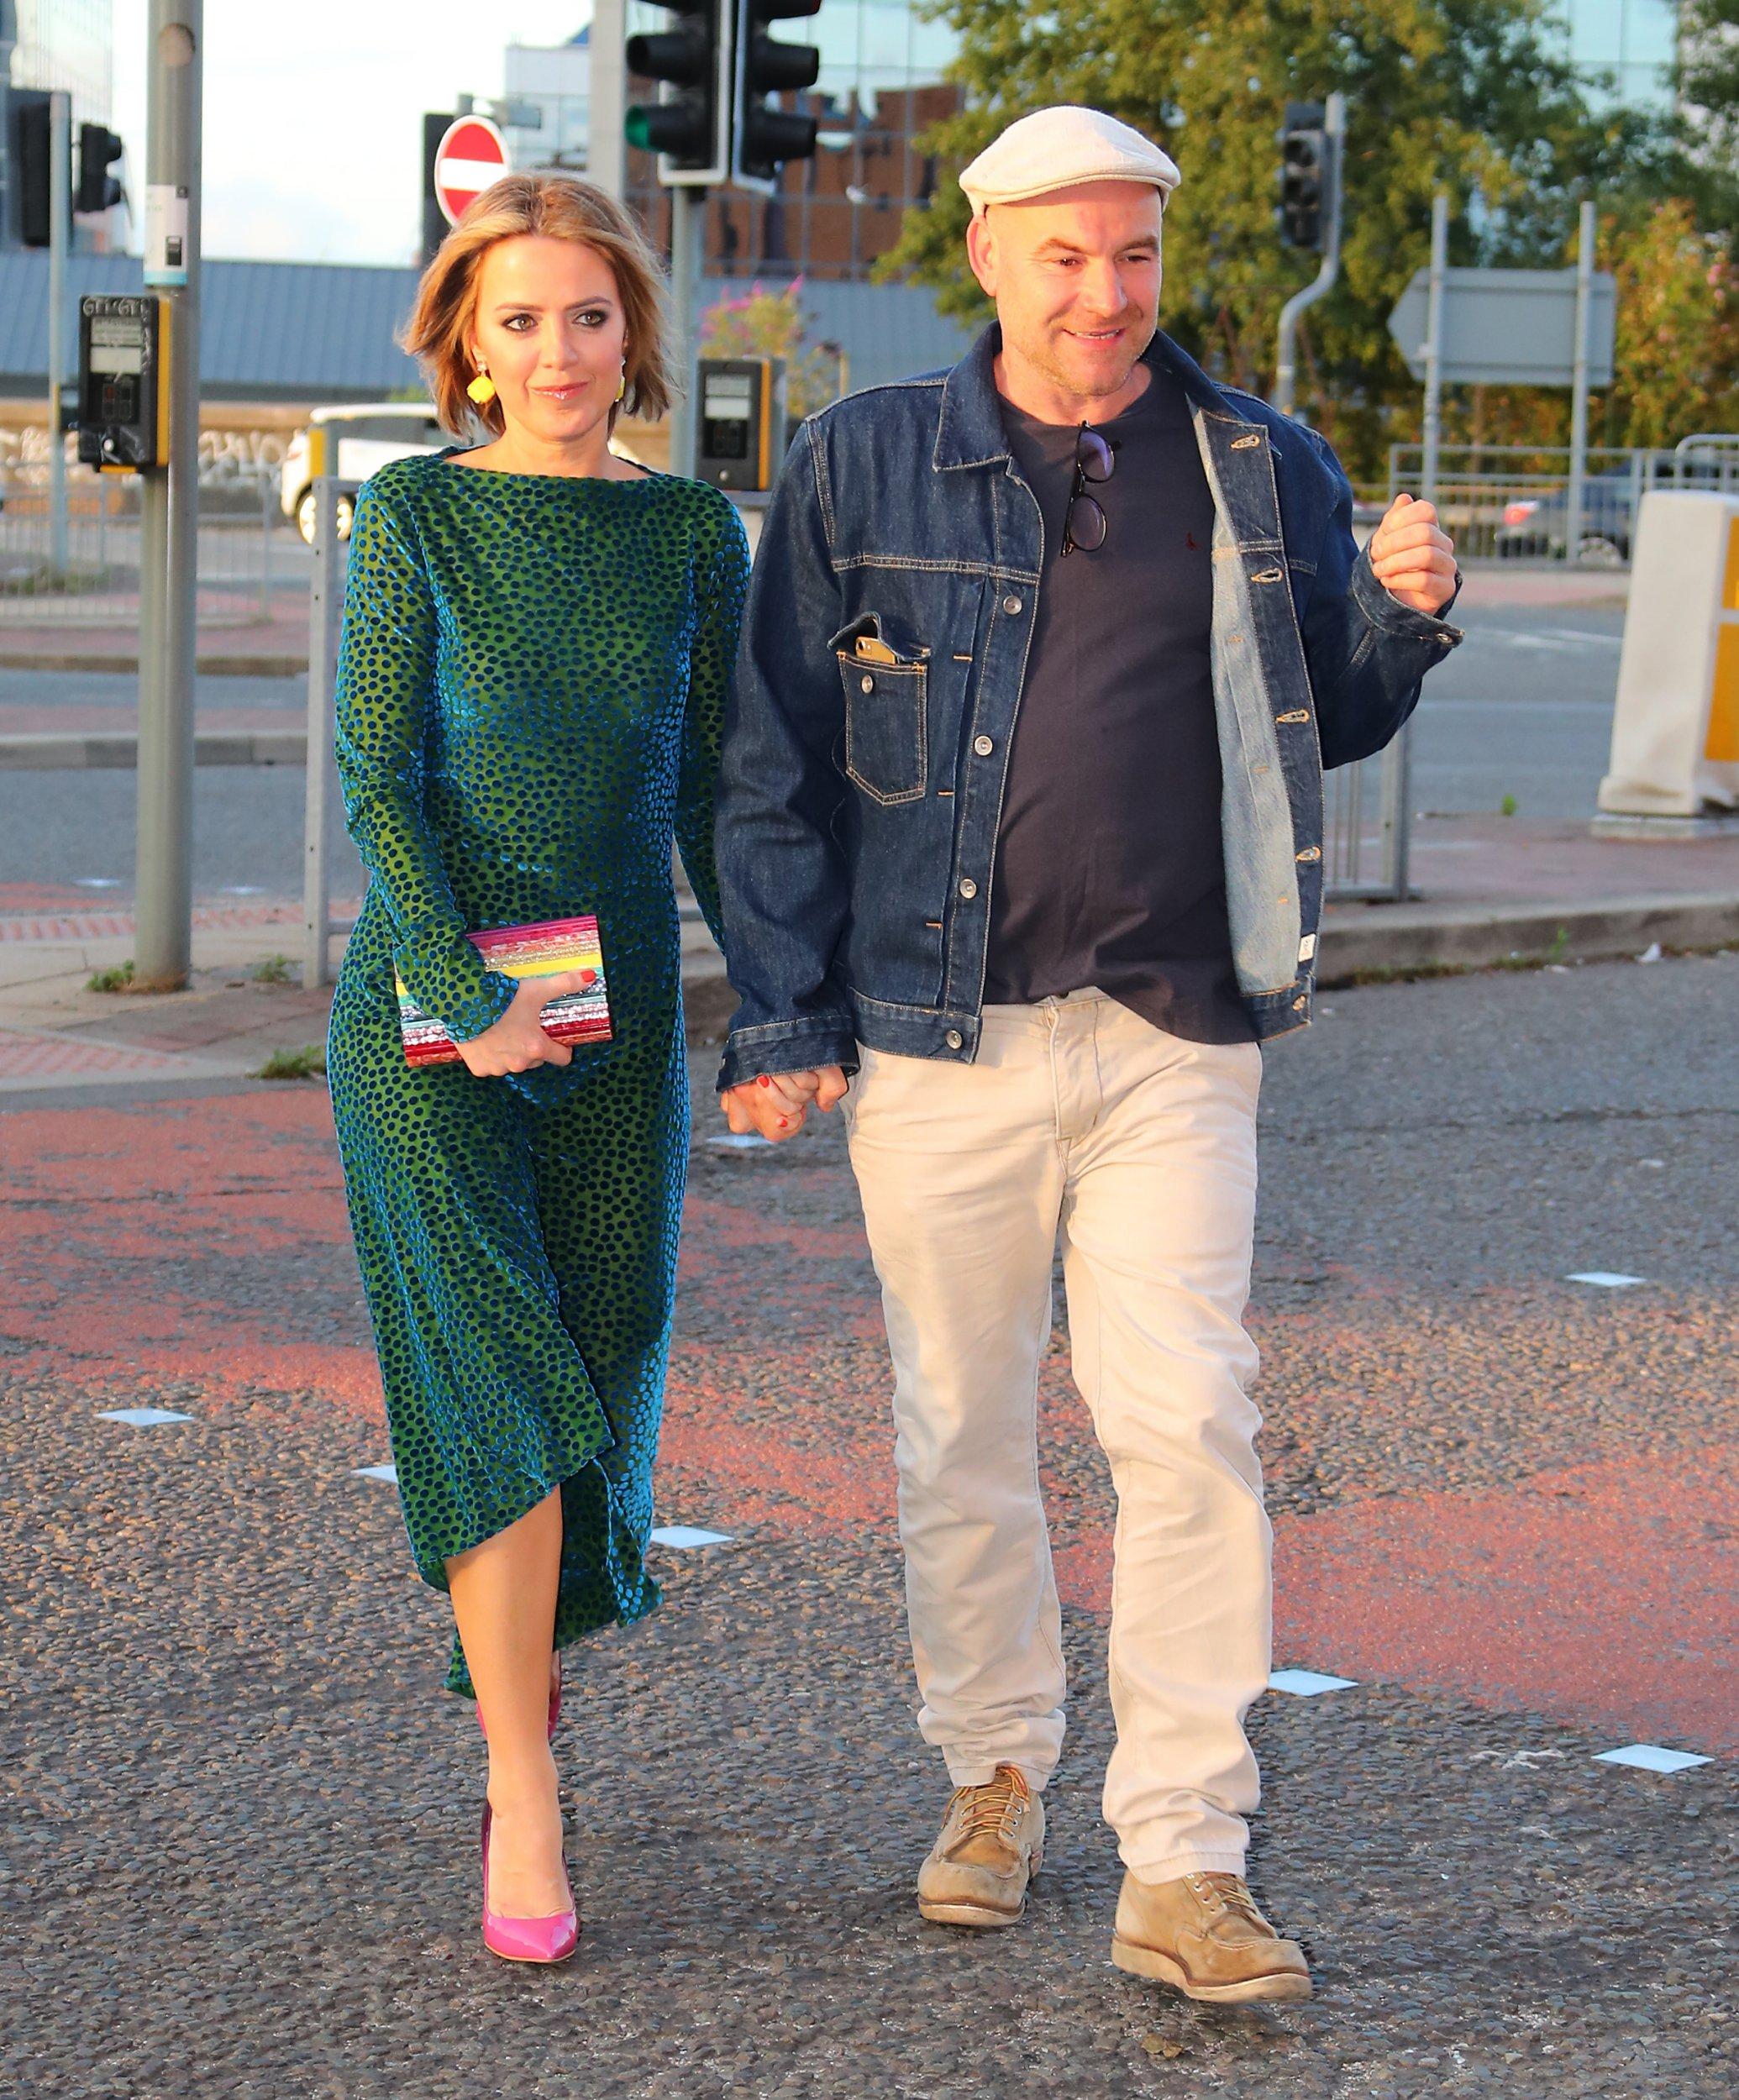 Are Coronation Street's Sally Carman and Joe Duttine dating?